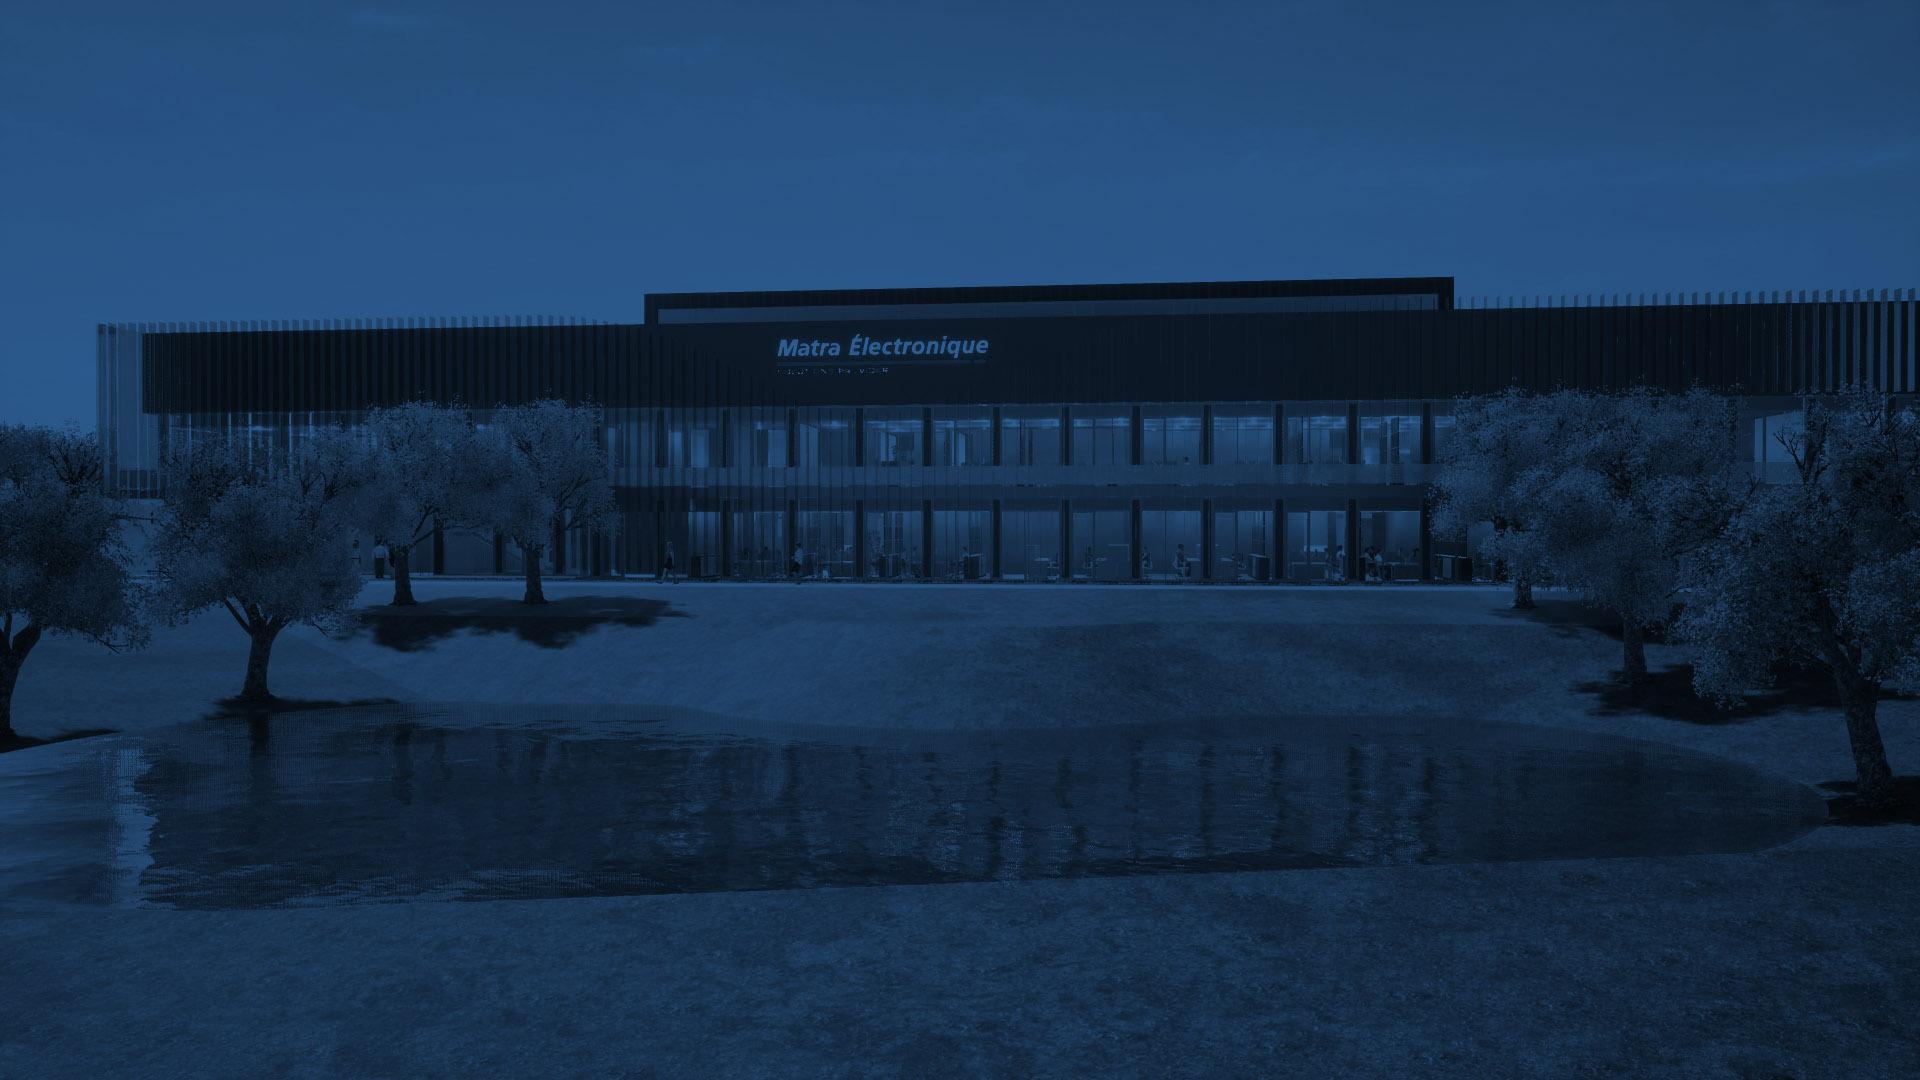 IMG2-FOND-projet-horizon-usine-future-4-0-matra-electronique